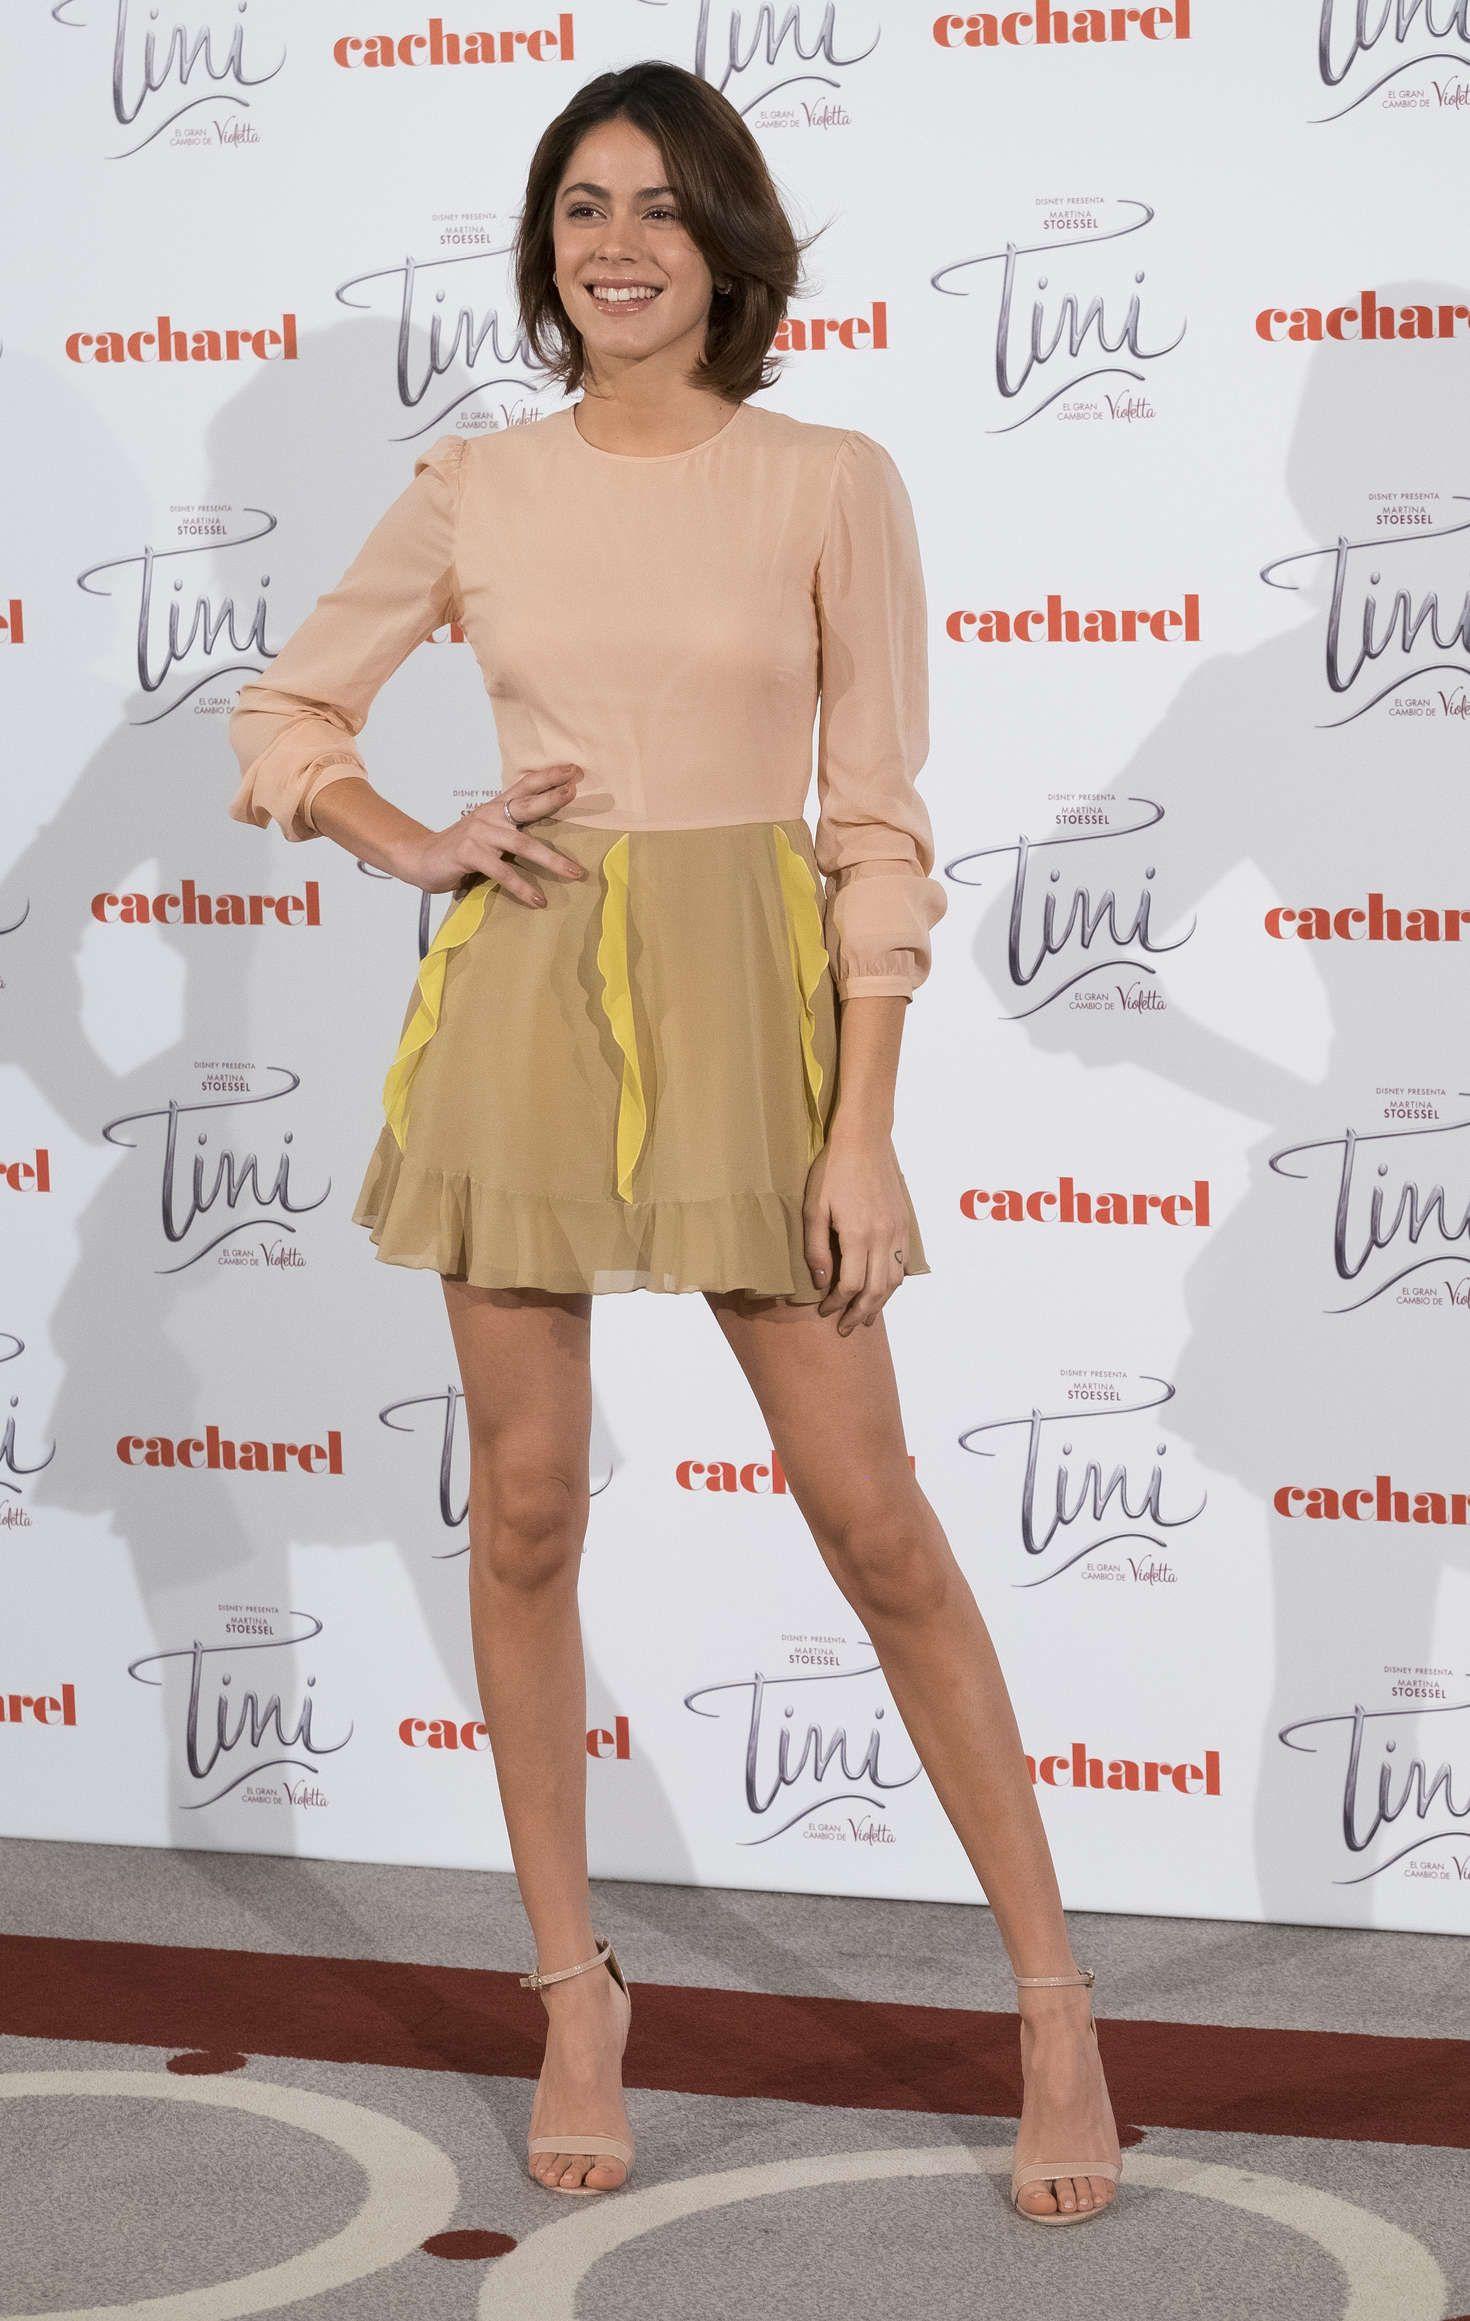 Celebrites Mariam Violeta nudes (71 photos), Sexy, Paparazzi, Boobs, cleavage 2020